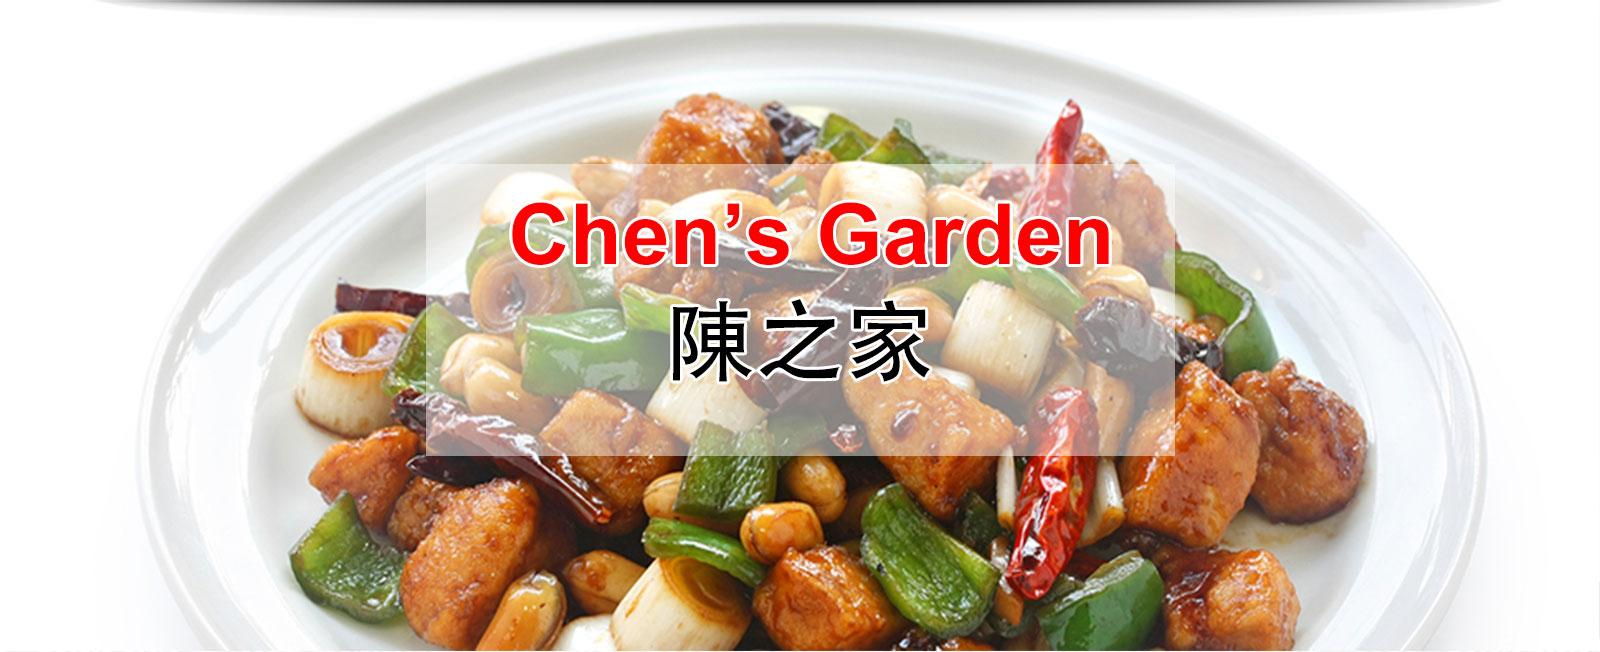 menu chens garden - Chens Garden